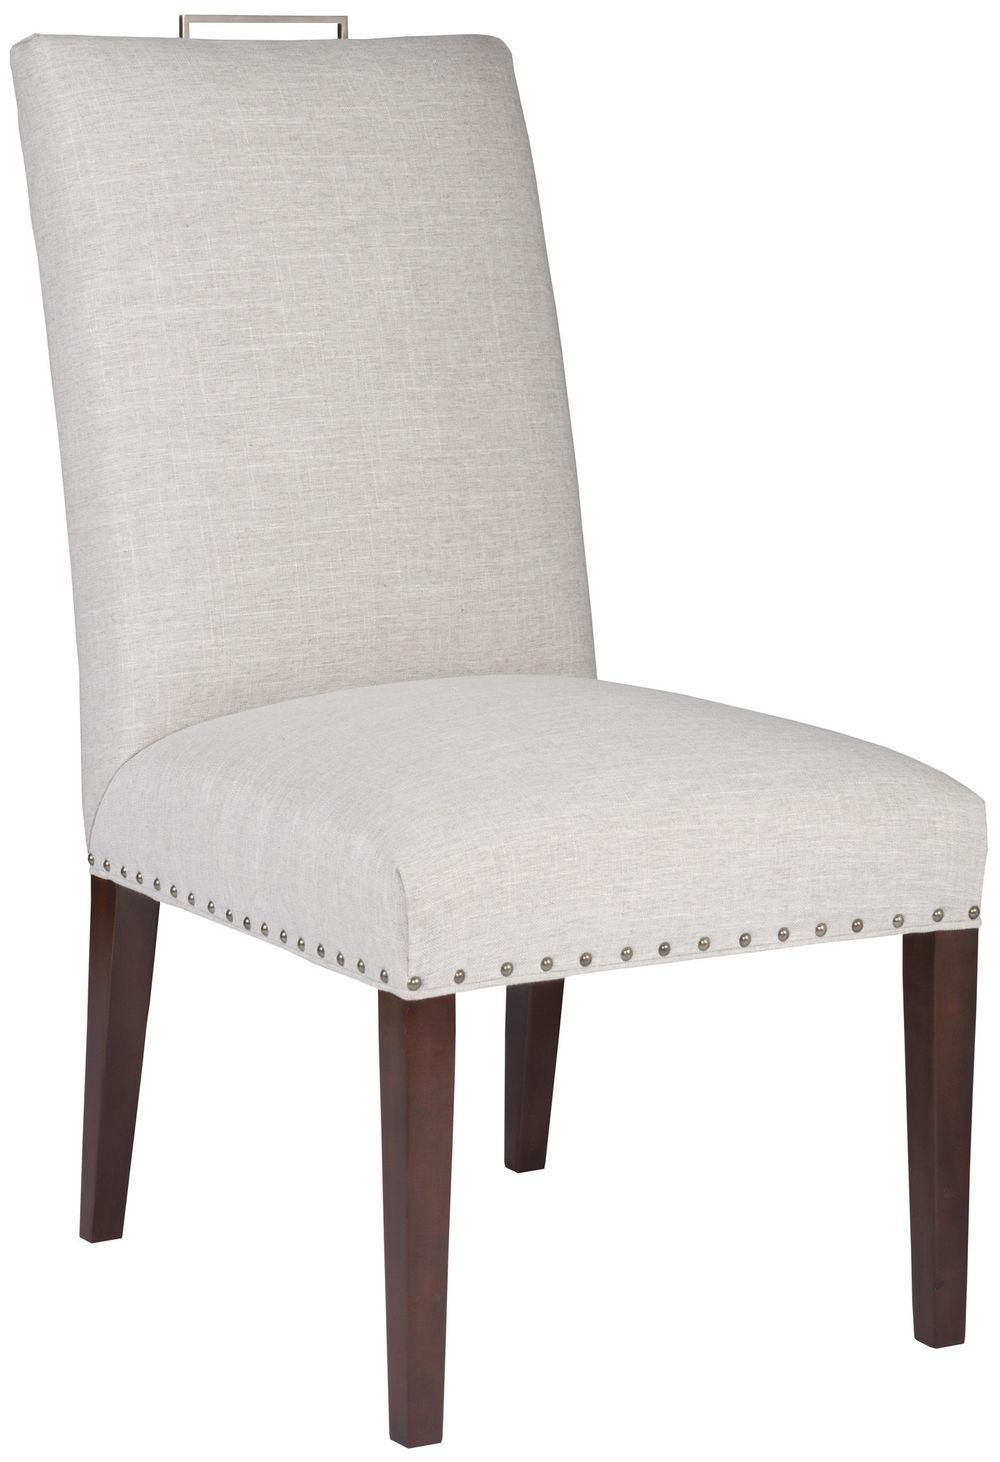 Vanguard Furniture - Everhart Side Chair